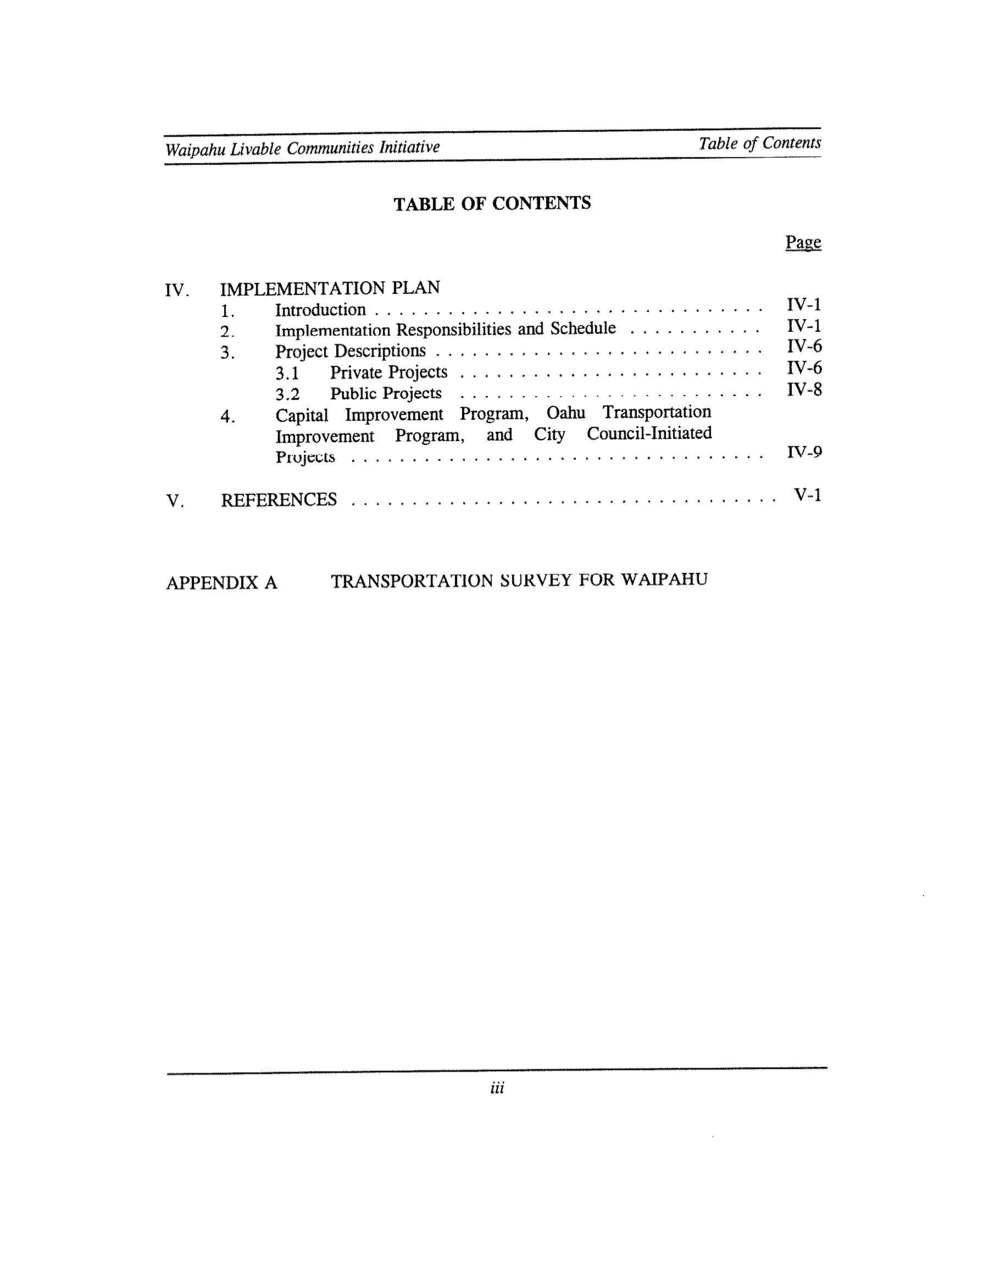 160531_WaipahuLivableCommunities(1998)_Page_005.jpg